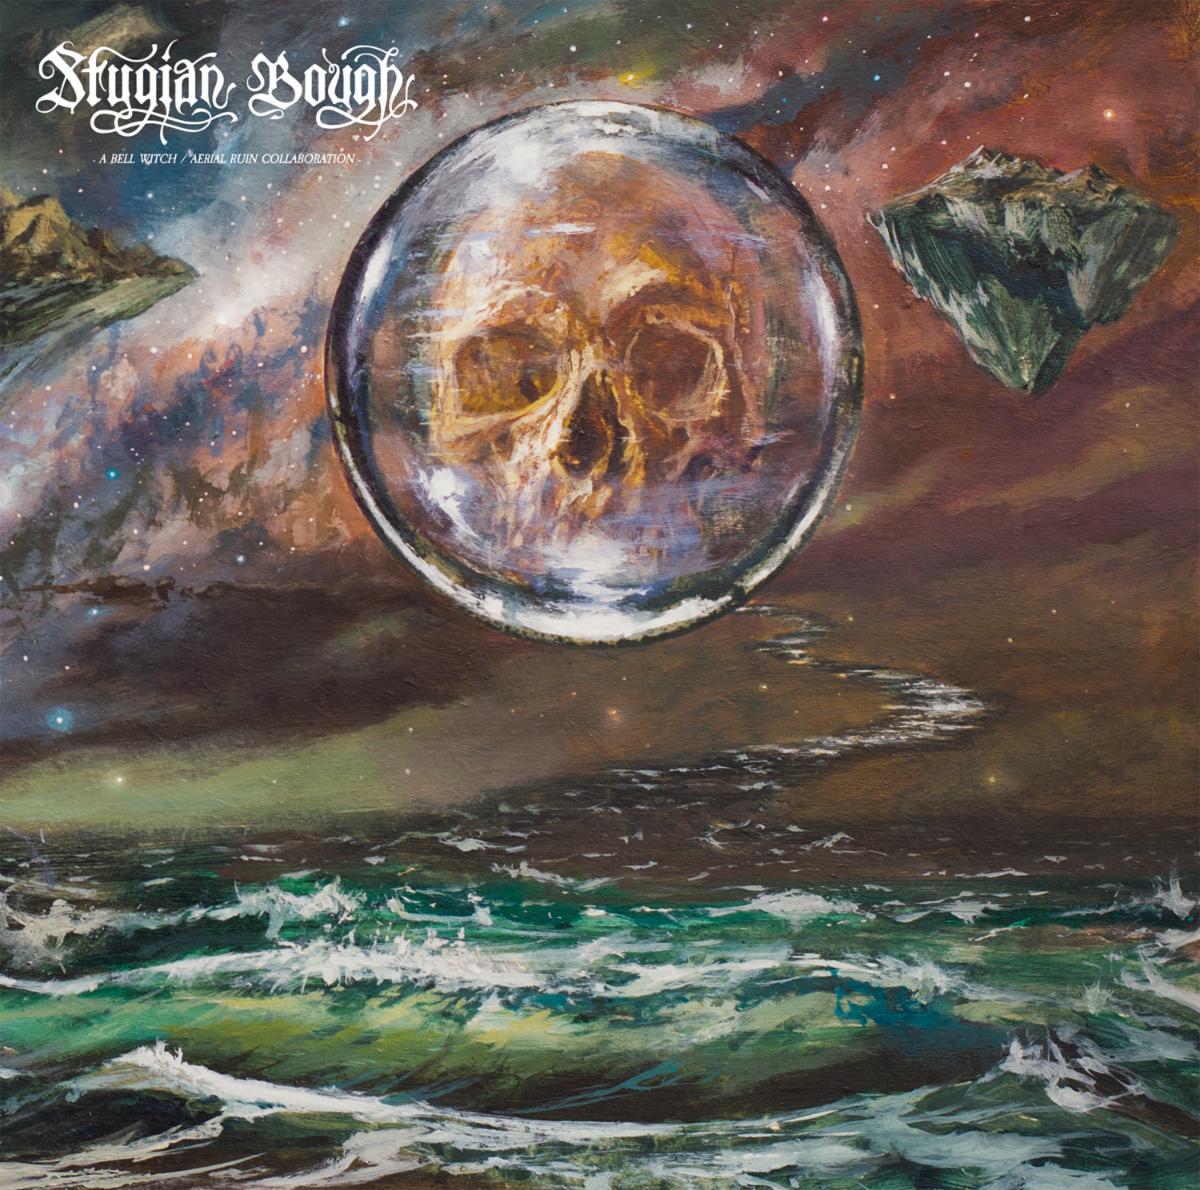 bell witch aerial ruin Stygian Bough Volume 1